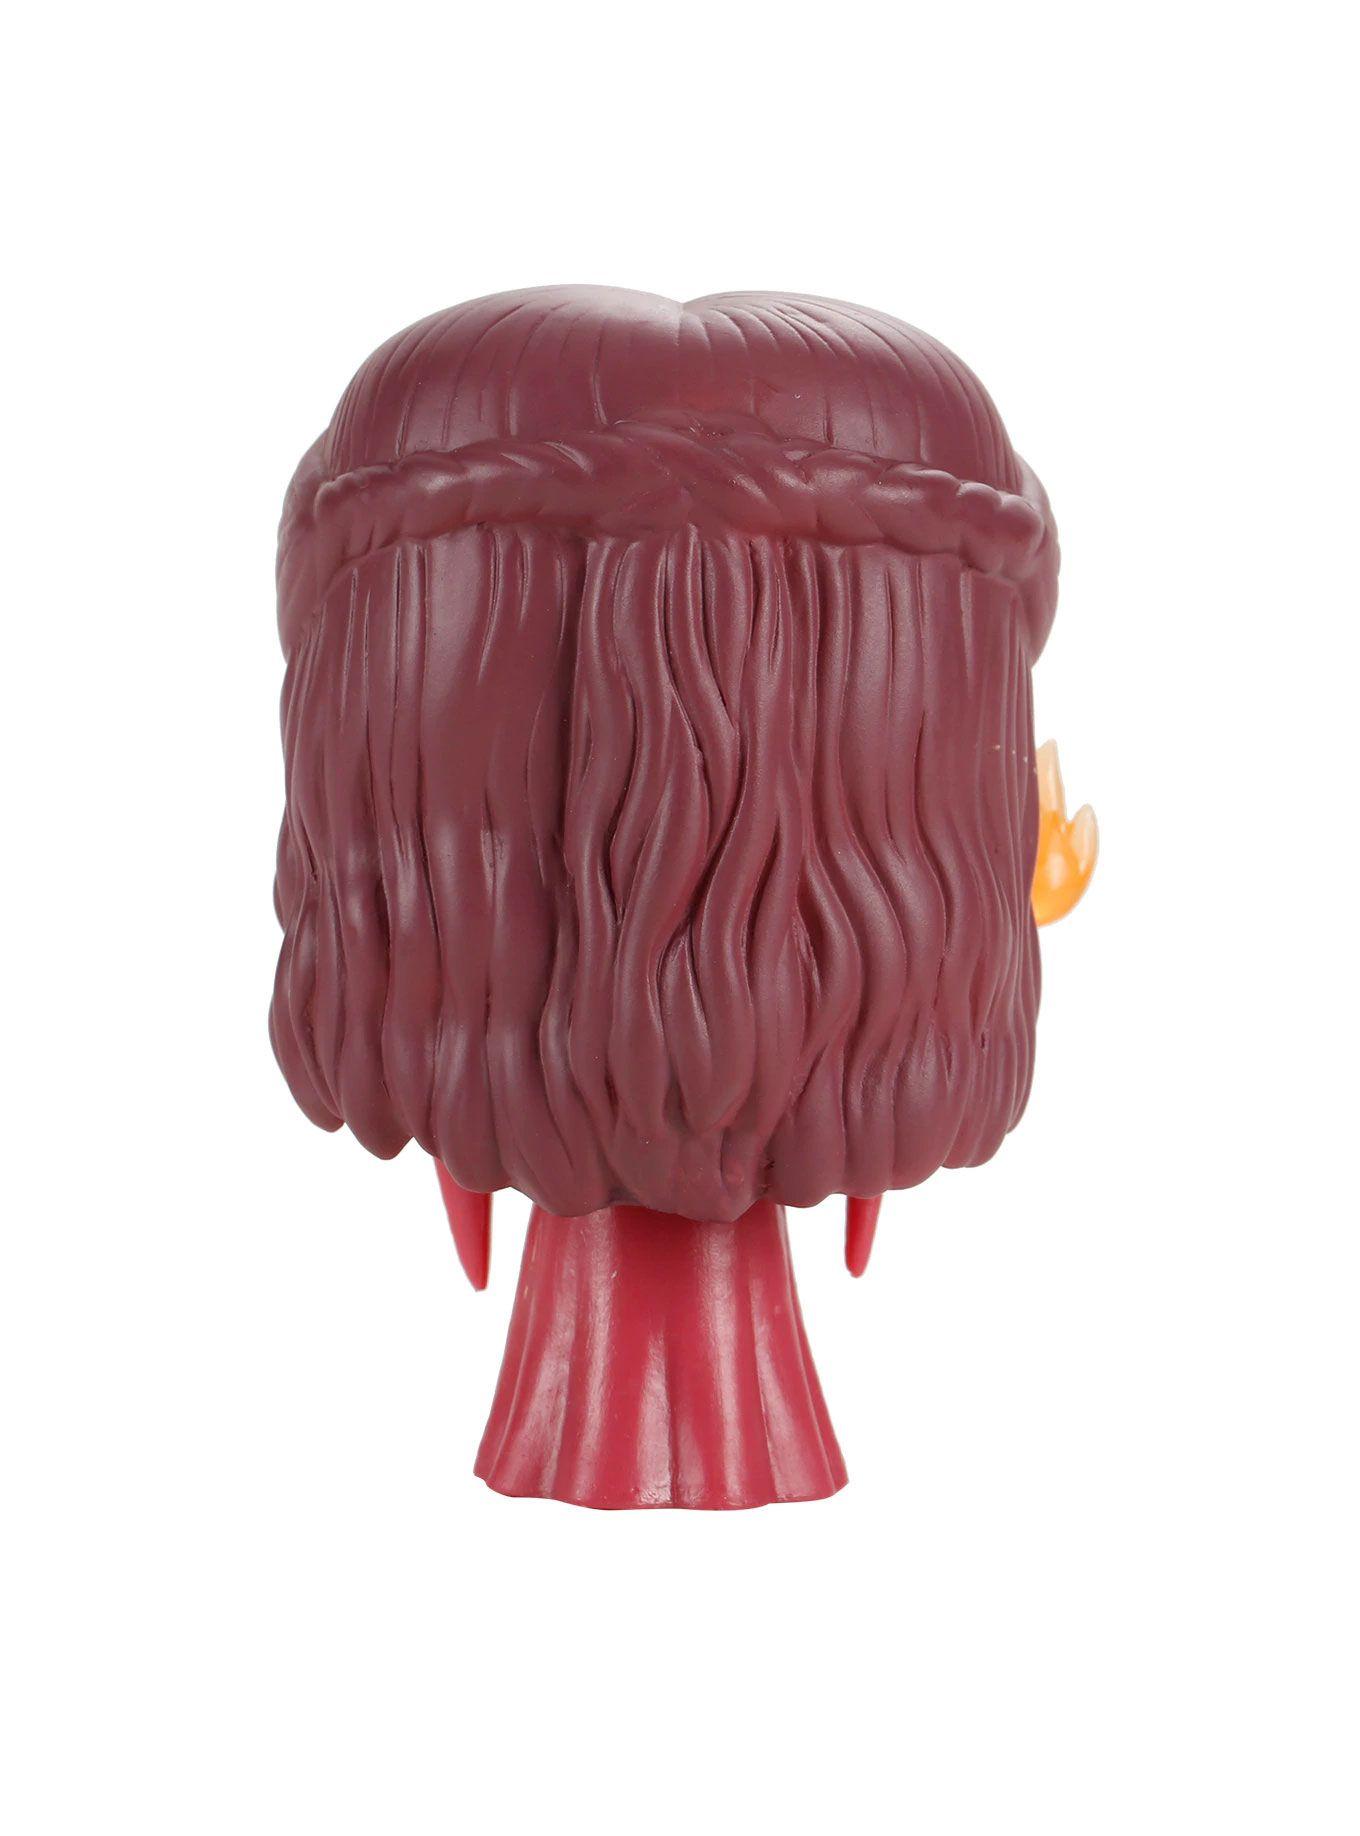 Melisandre #42 - Game Of Thrones - Funko Pop!